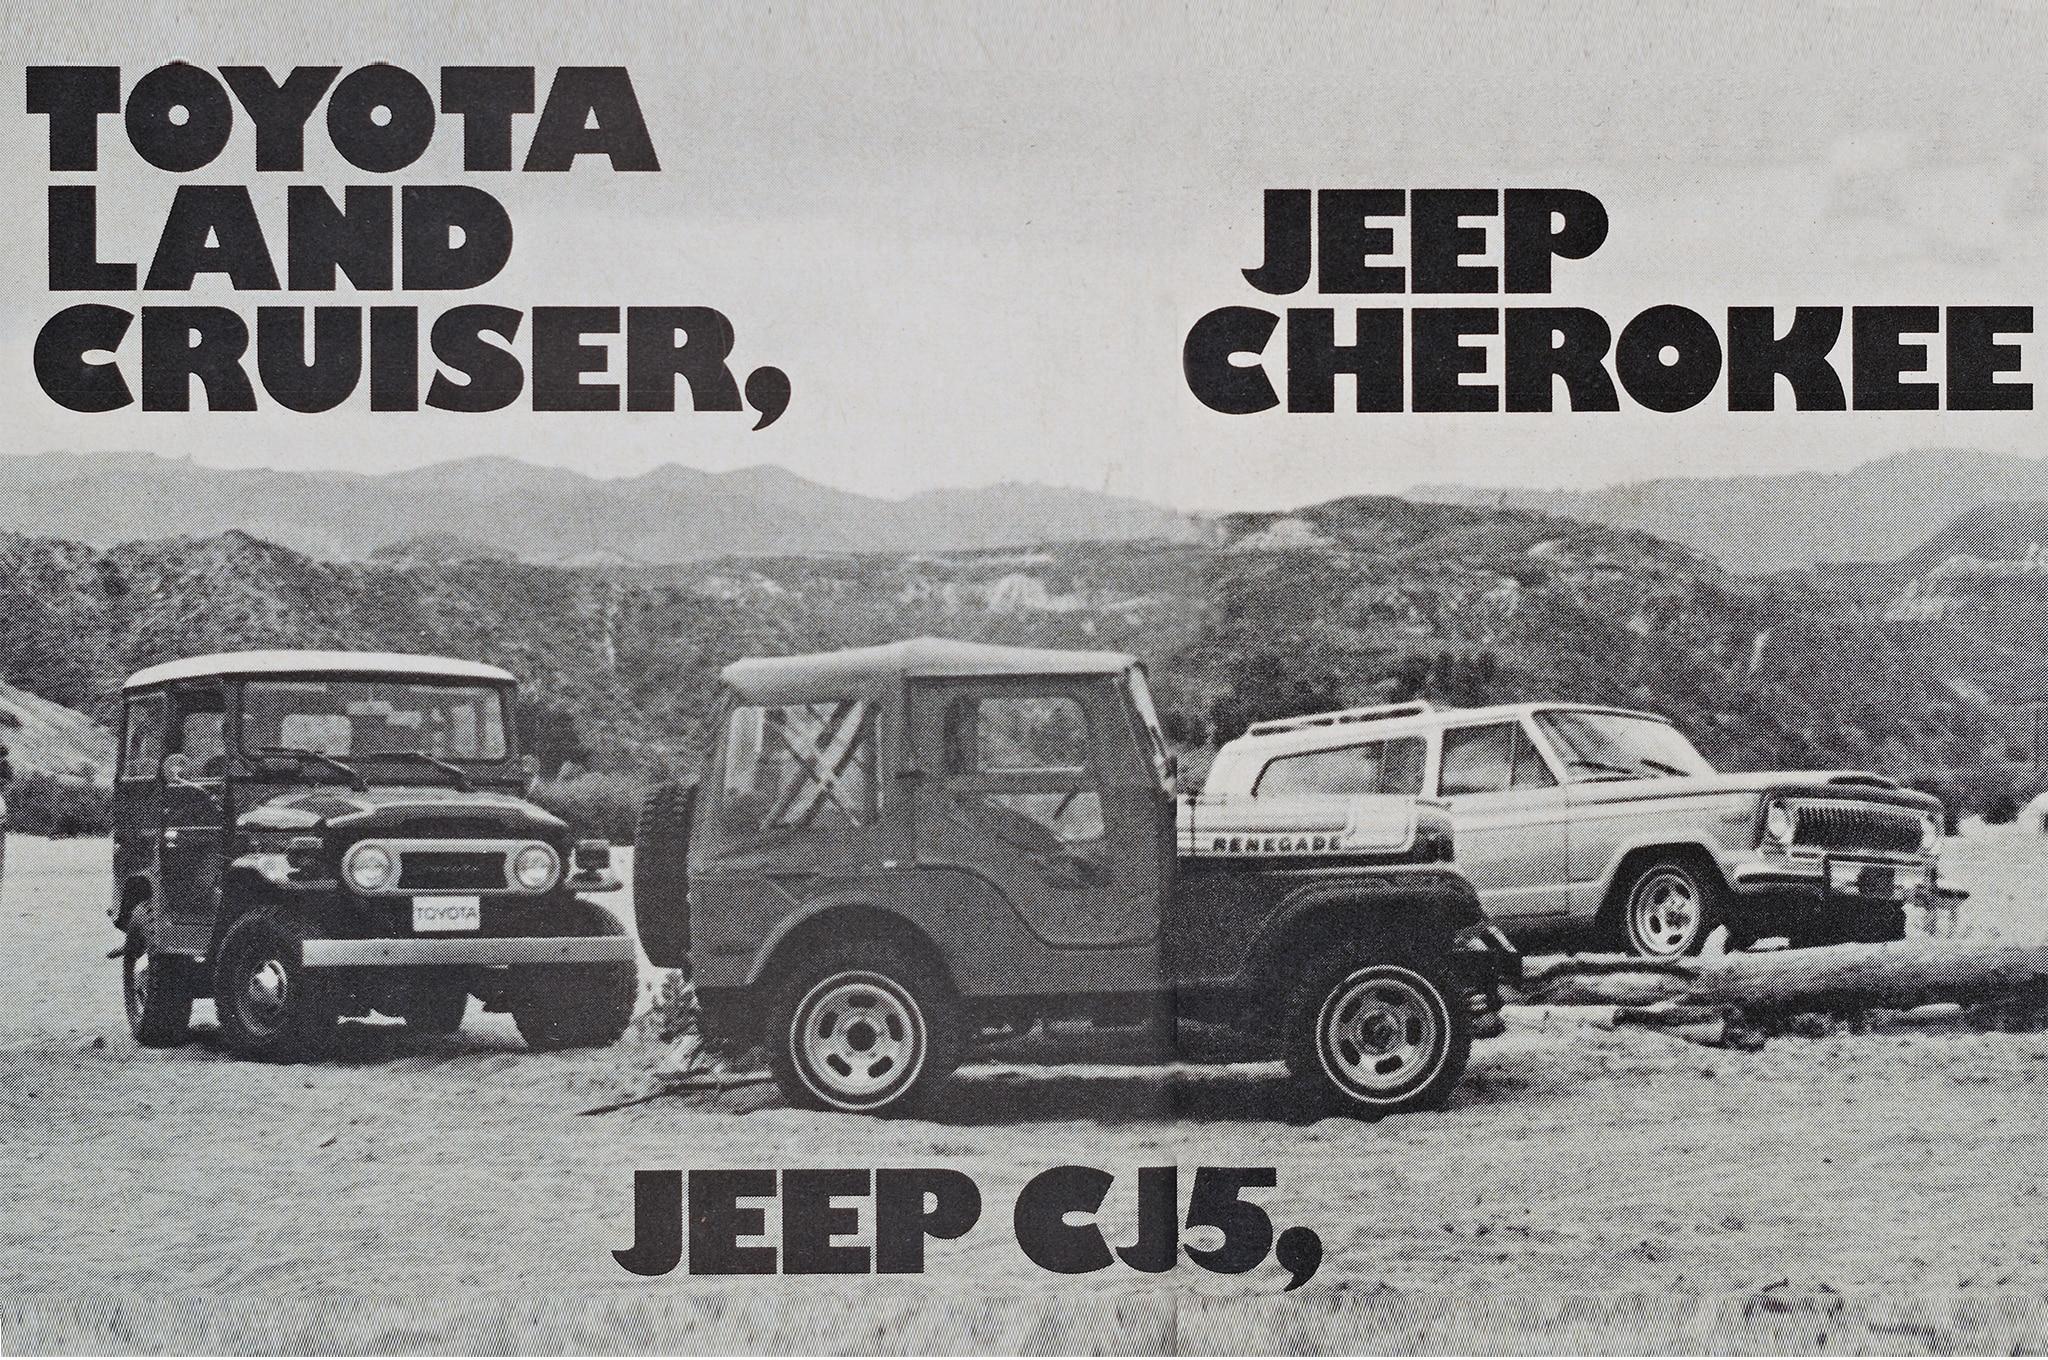 Jeep Cherokee Vs Toyota Land Cruiser Vs Jeep CJ5